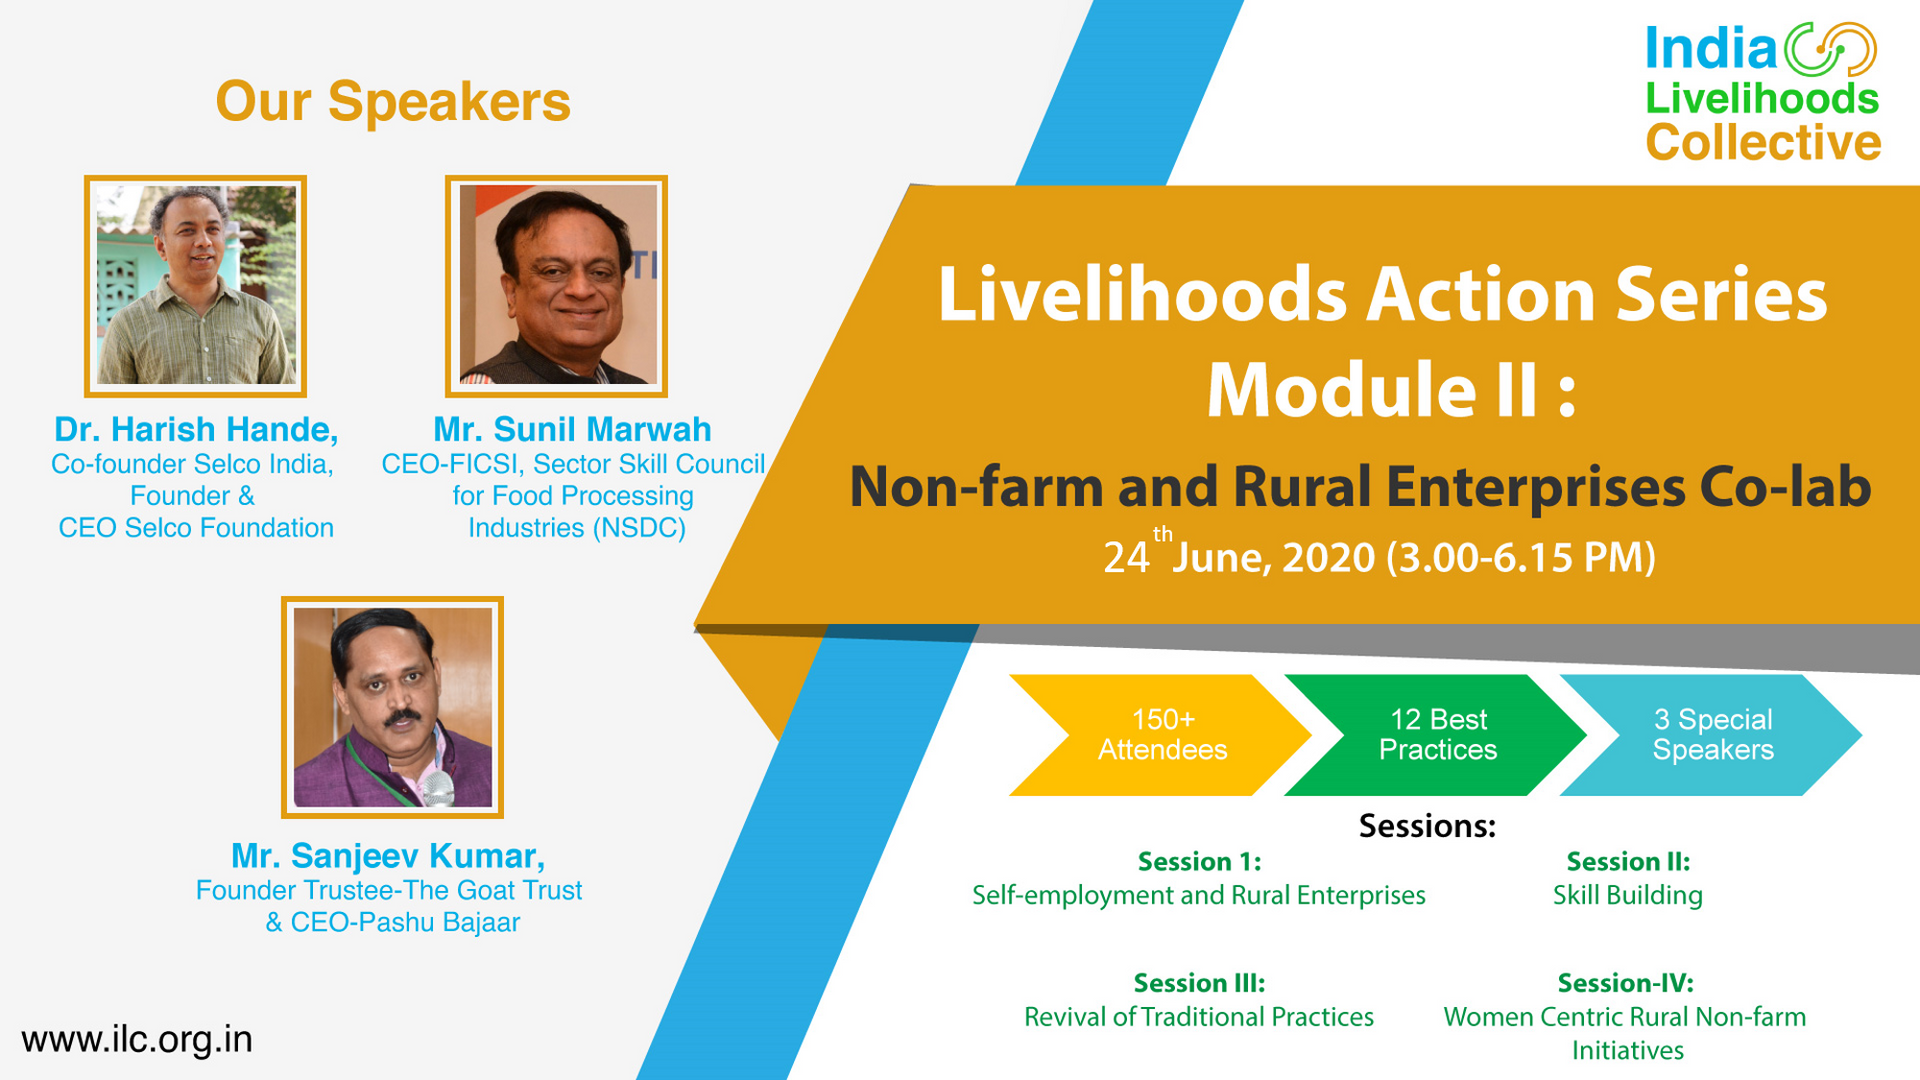 Non-farm & Rural Enterprises Co-lab